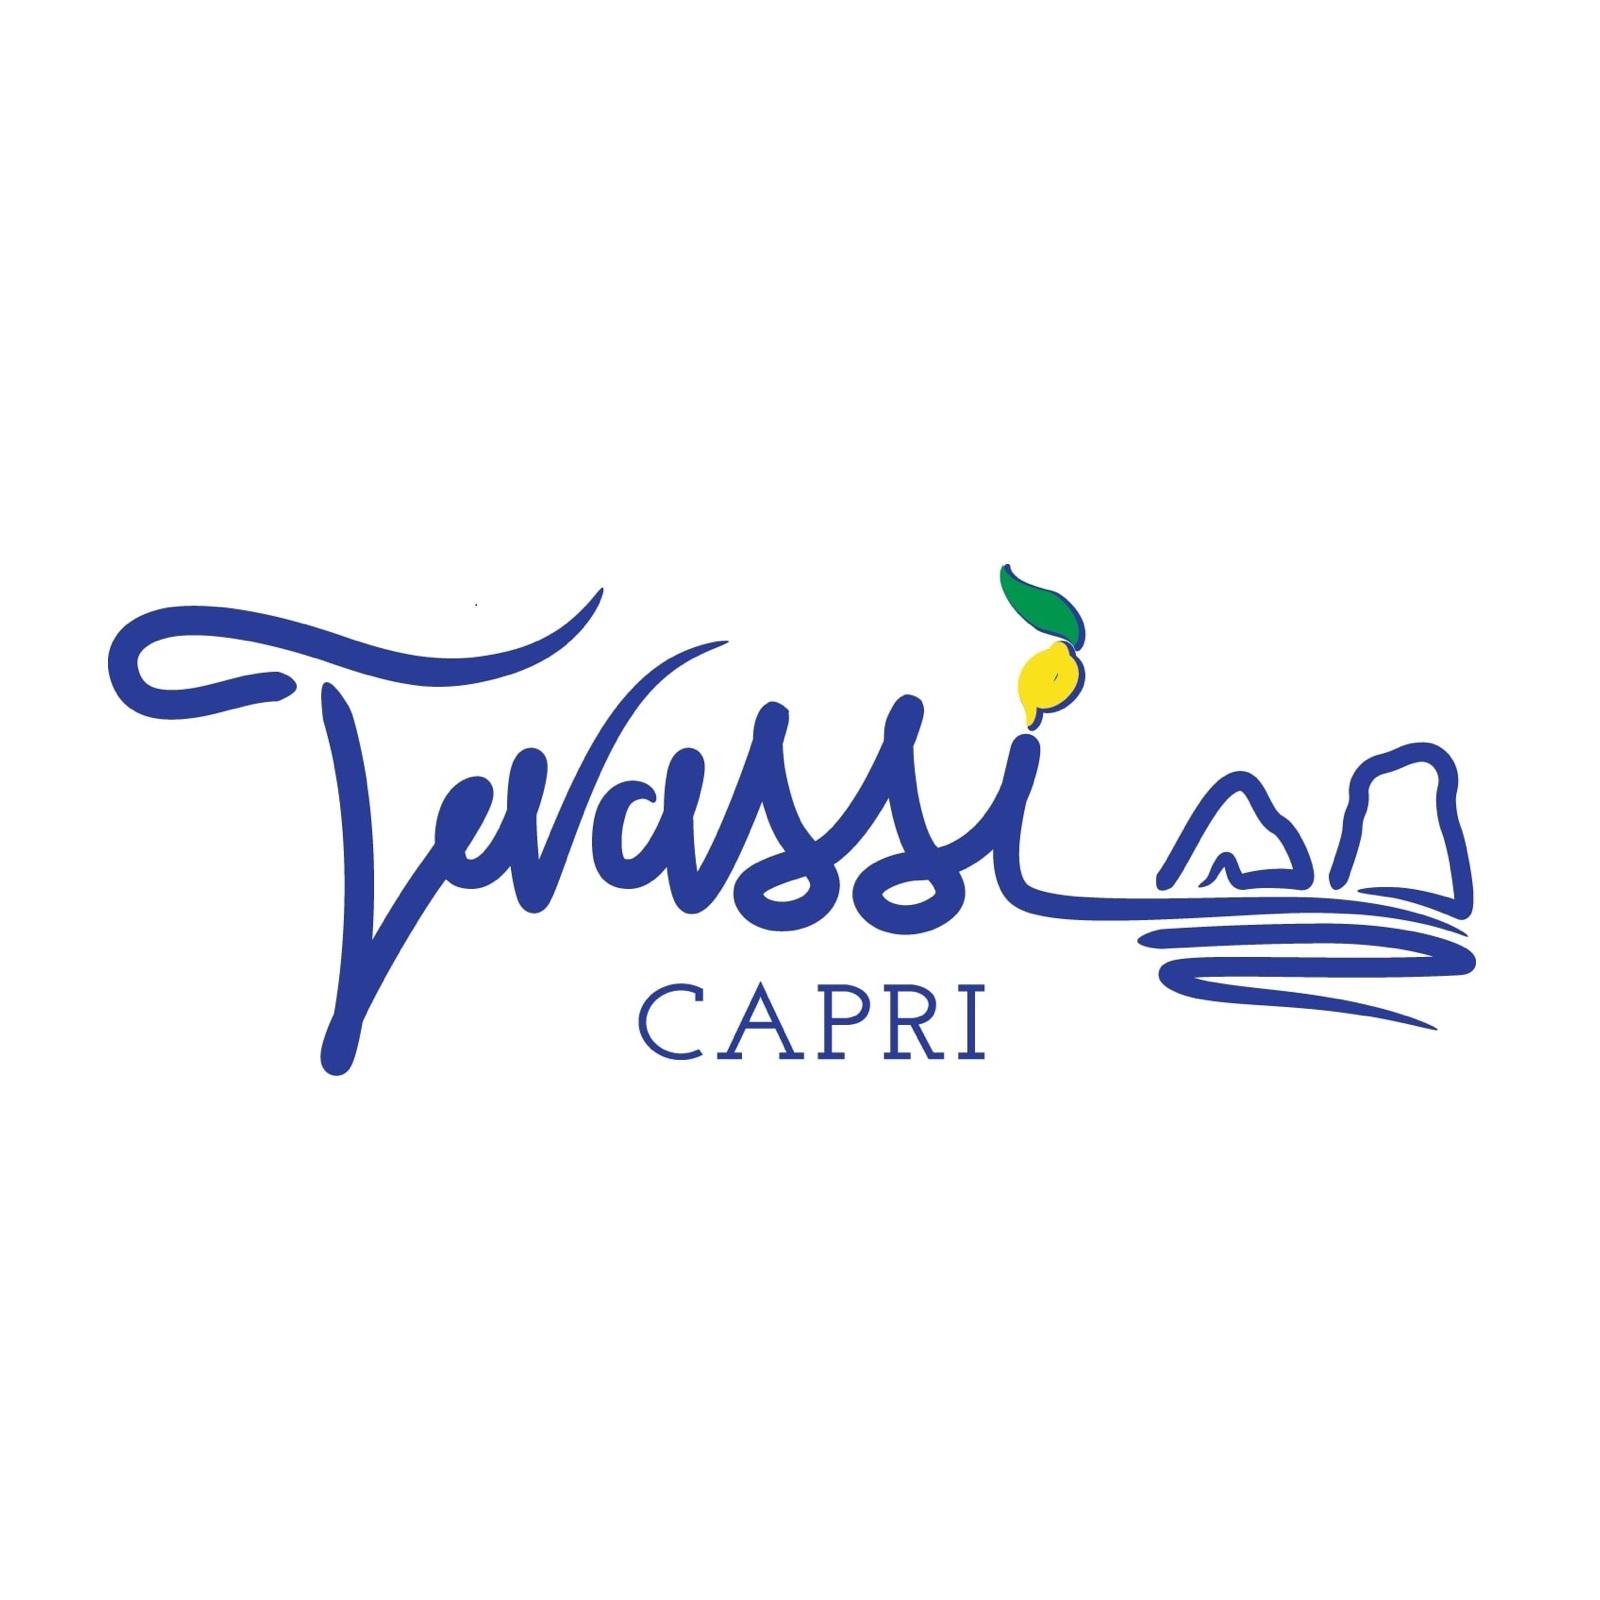 tavassi-capri-ceramisti-anacapri-napoli-profile